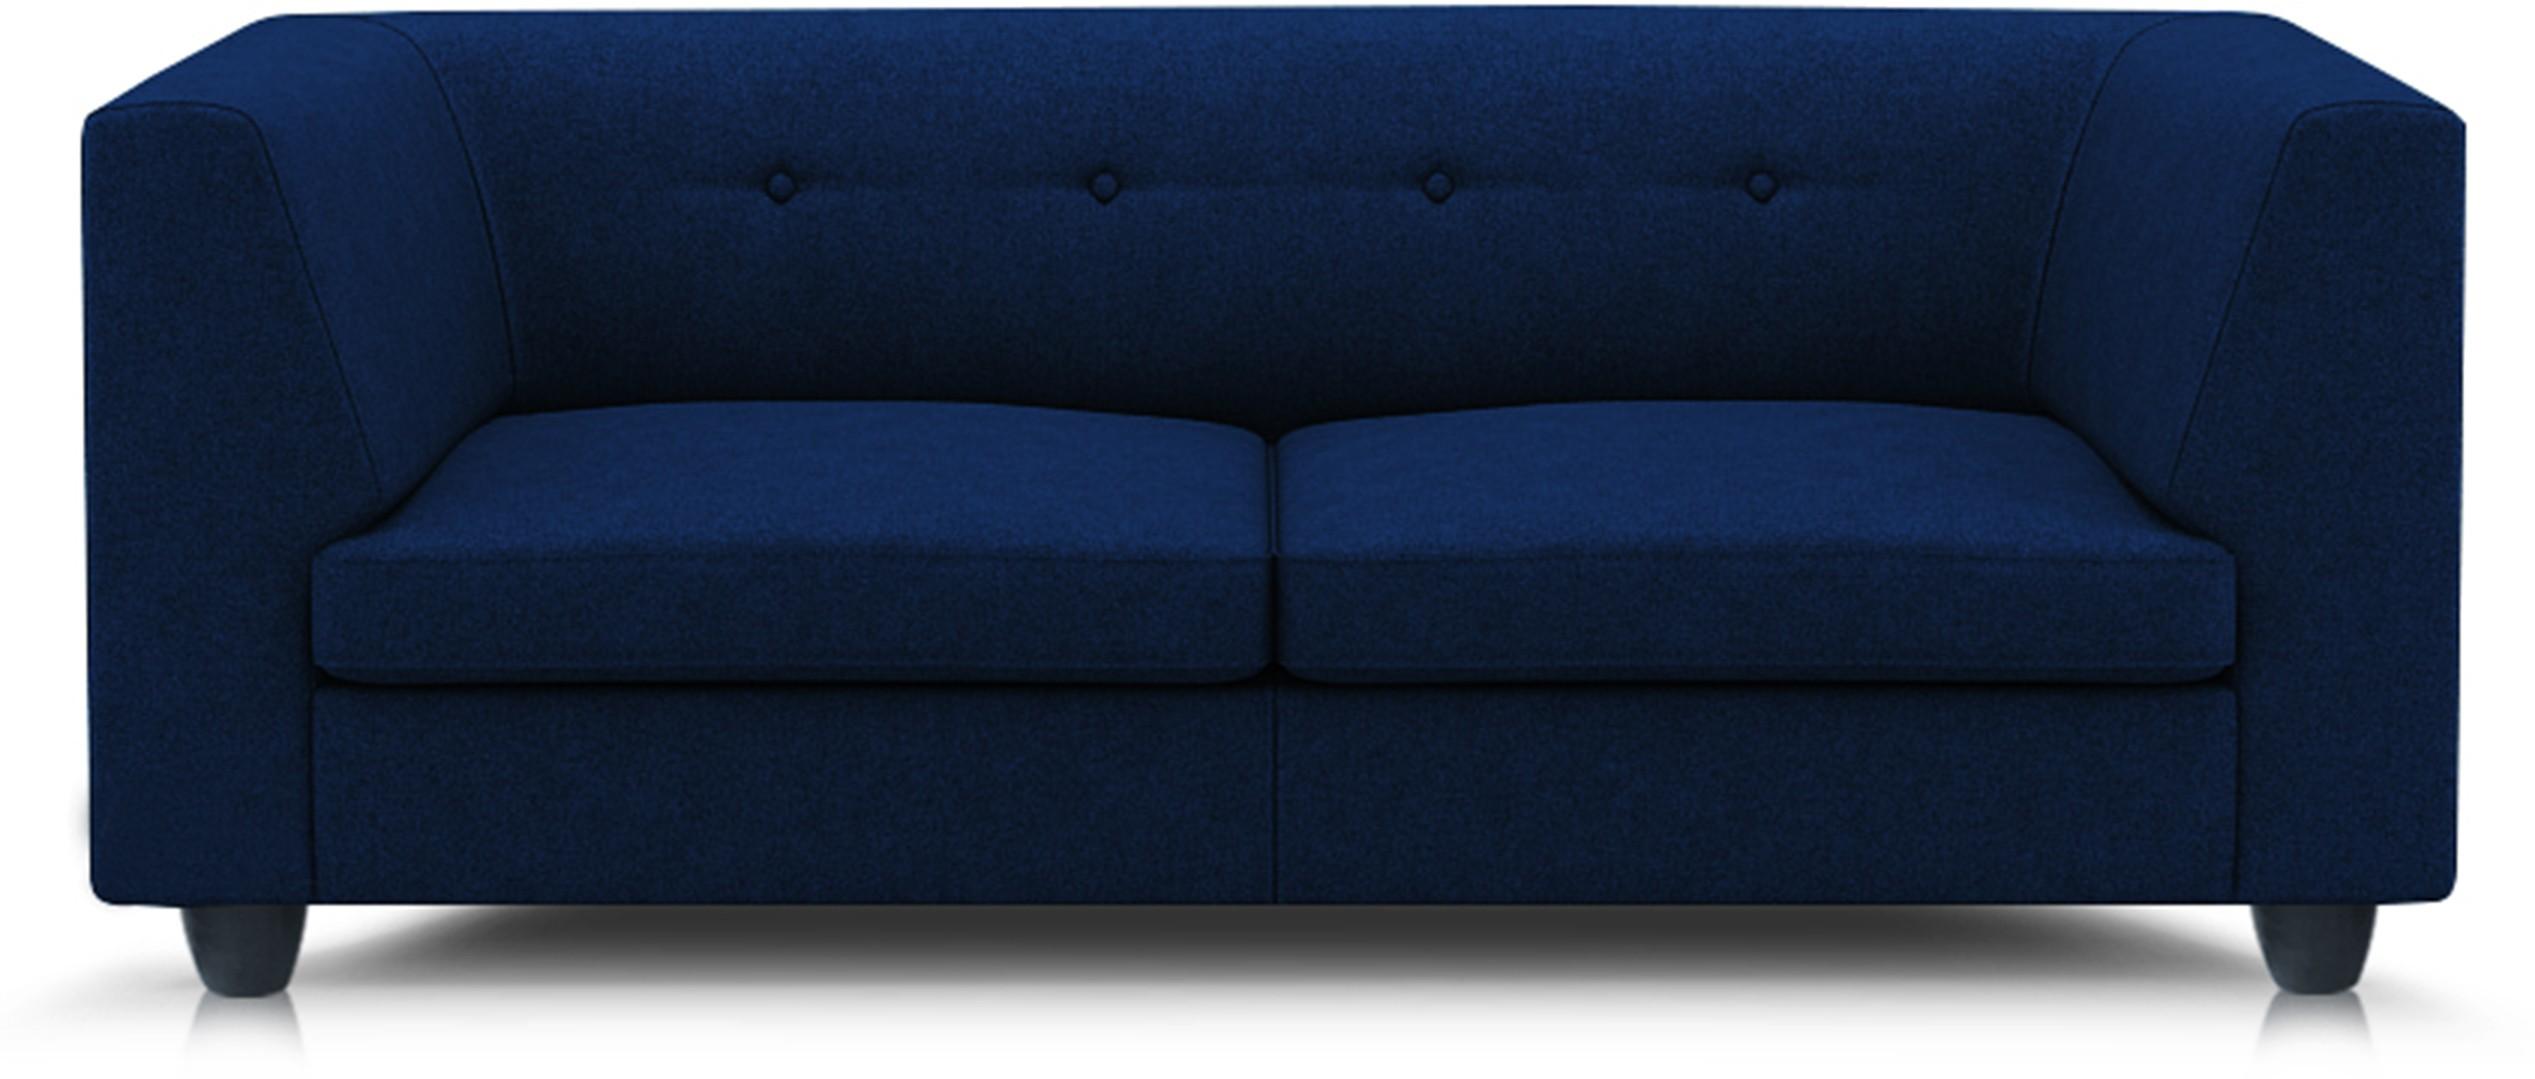 View Adorn homez Modern Solid Wood Sectional Navy Blue Sofa Set Furniture (Adorn homez)